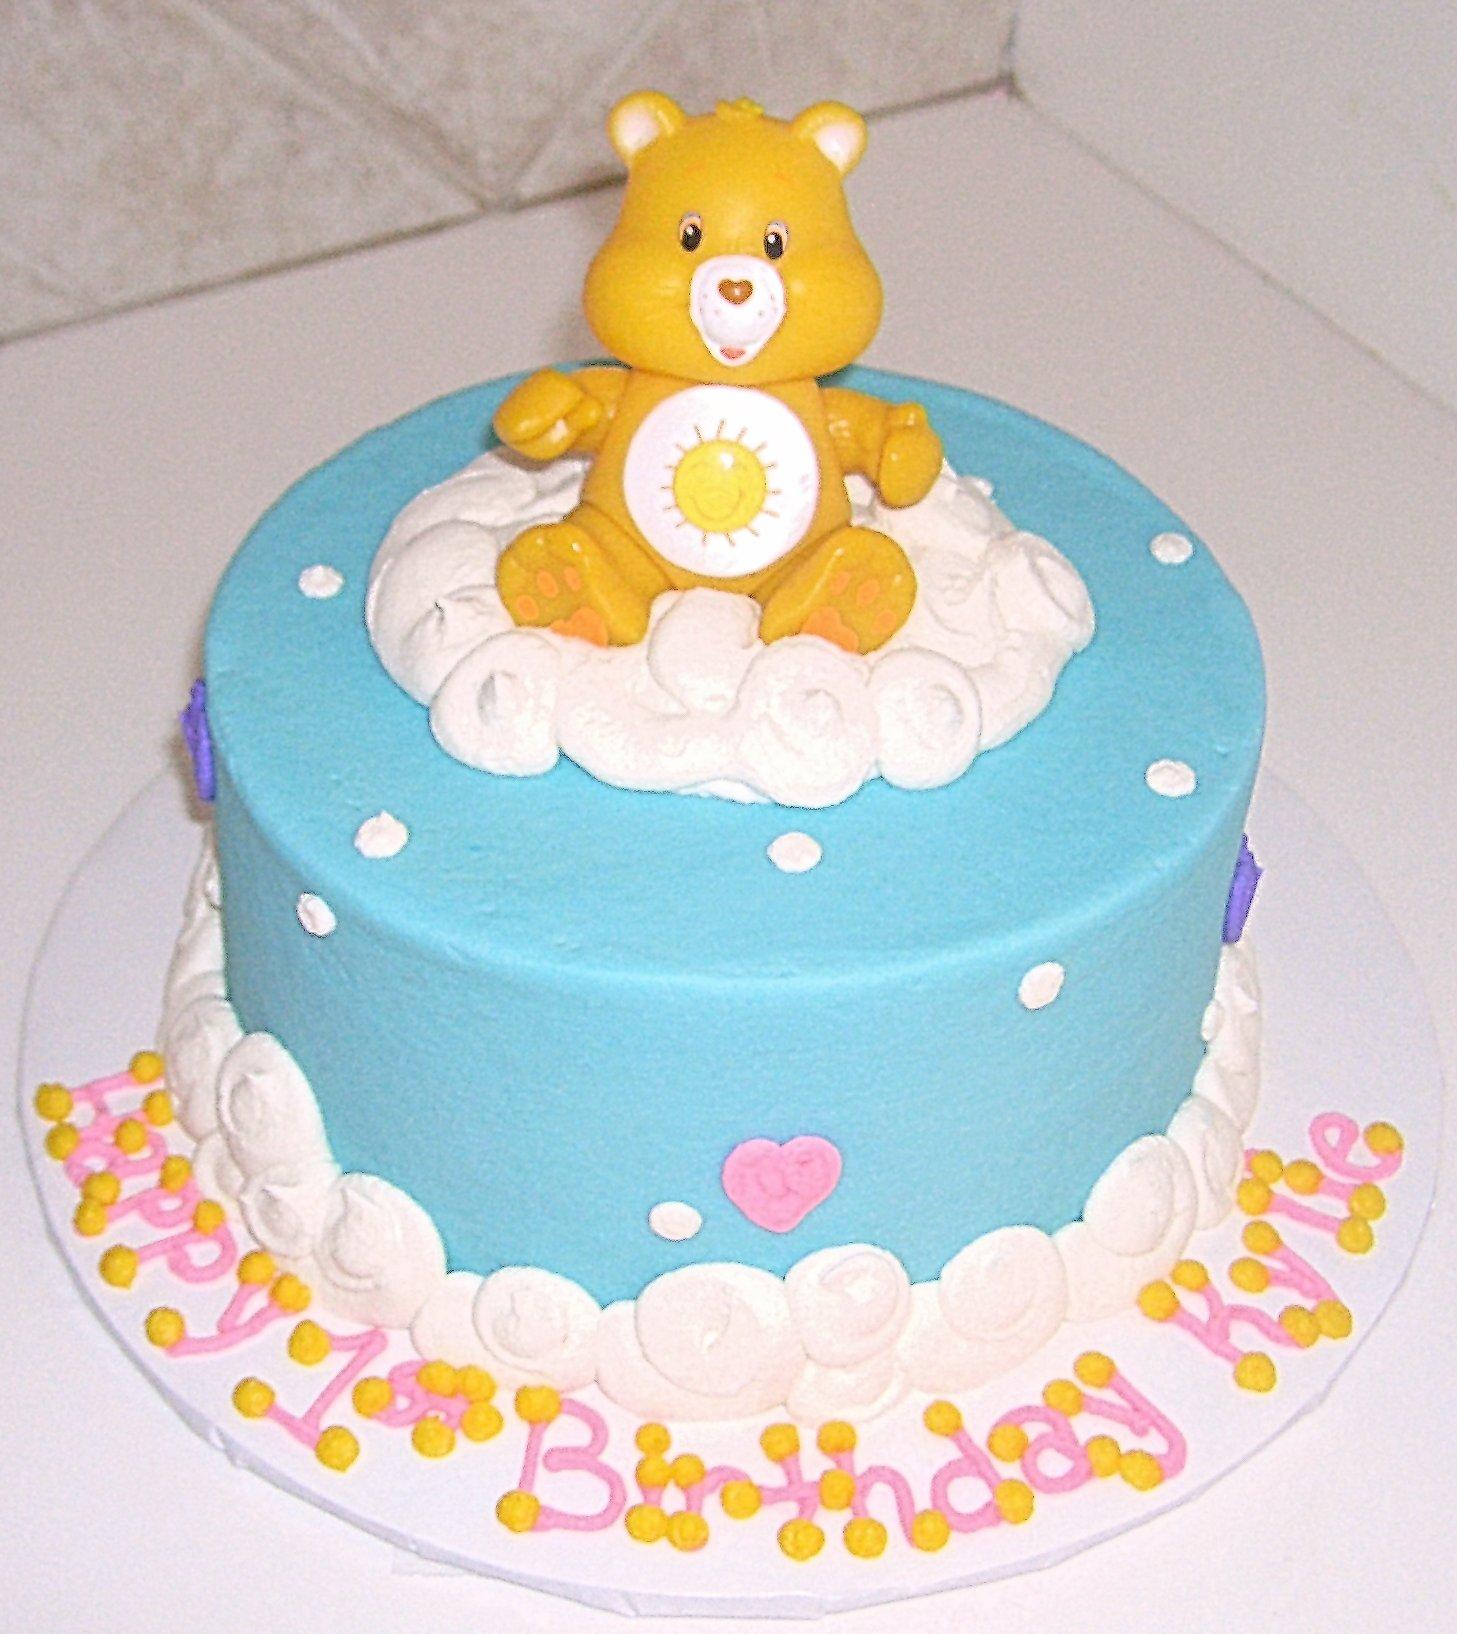 Astonishing 10 Care Bears Cakes Photo Gallery Photo Care Bear Cake Care Funny Birthday Cards Online Alyptdamsfinfo